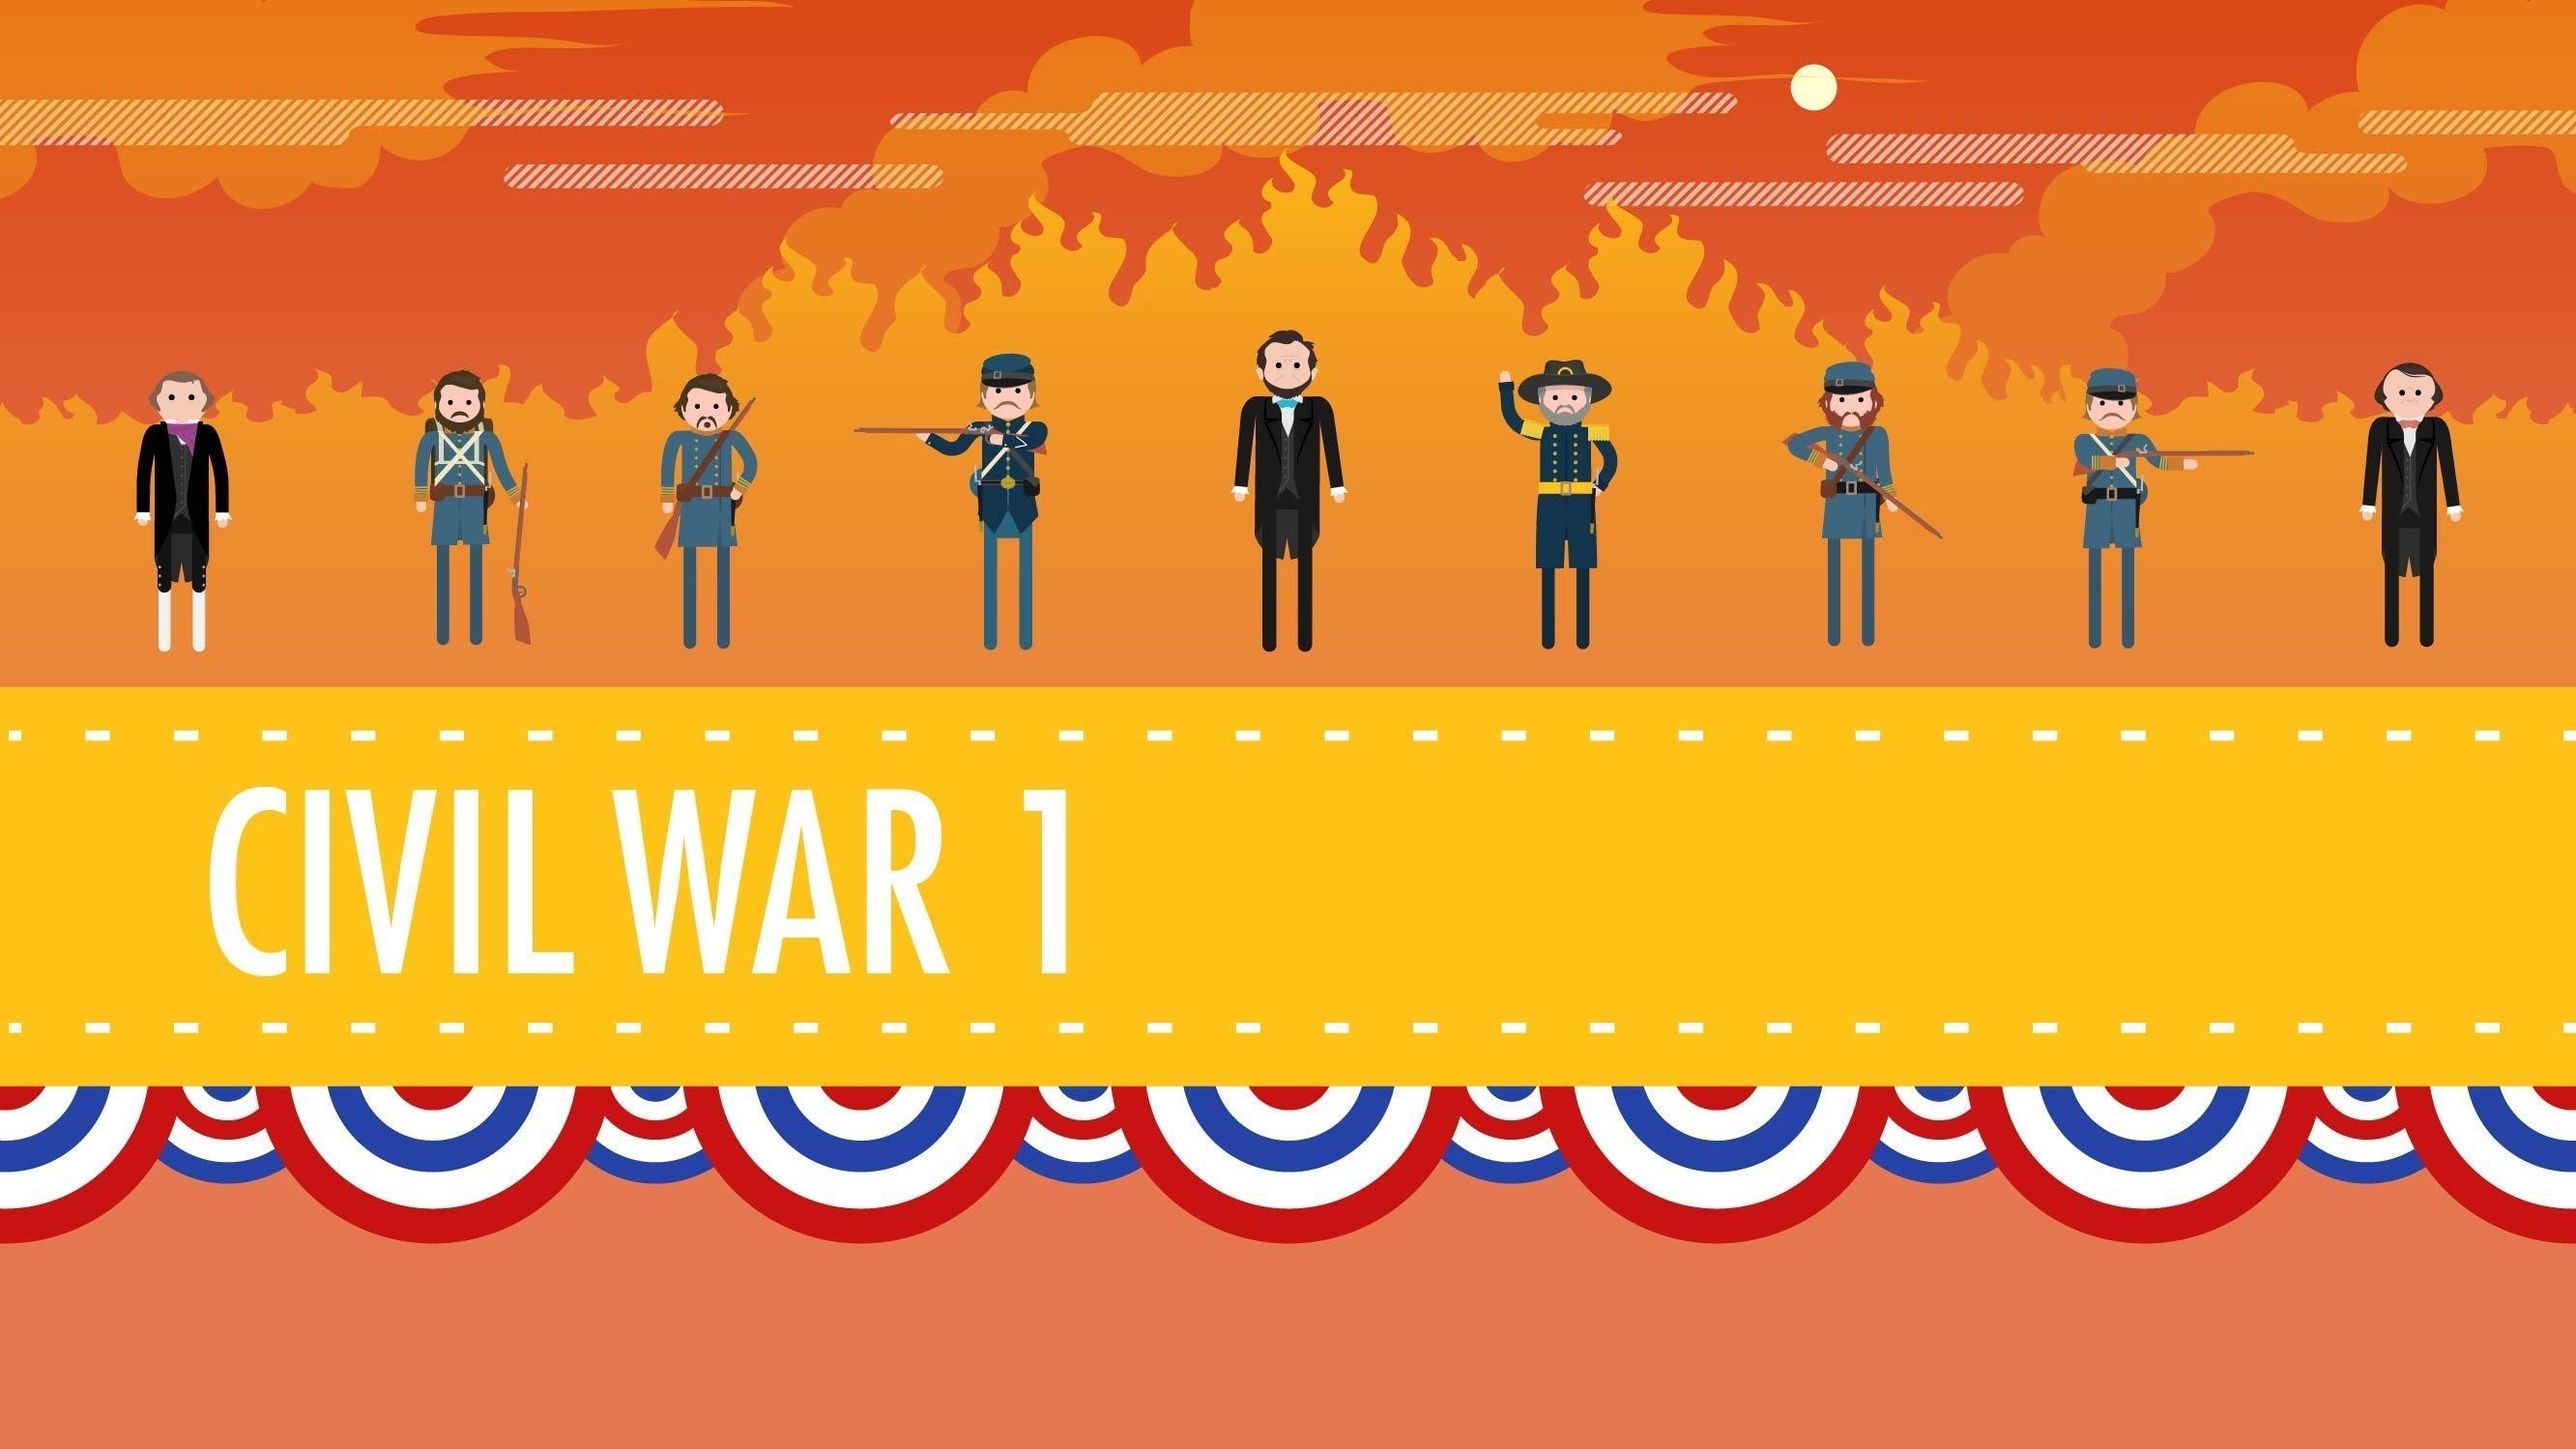 The Civil War Part 1